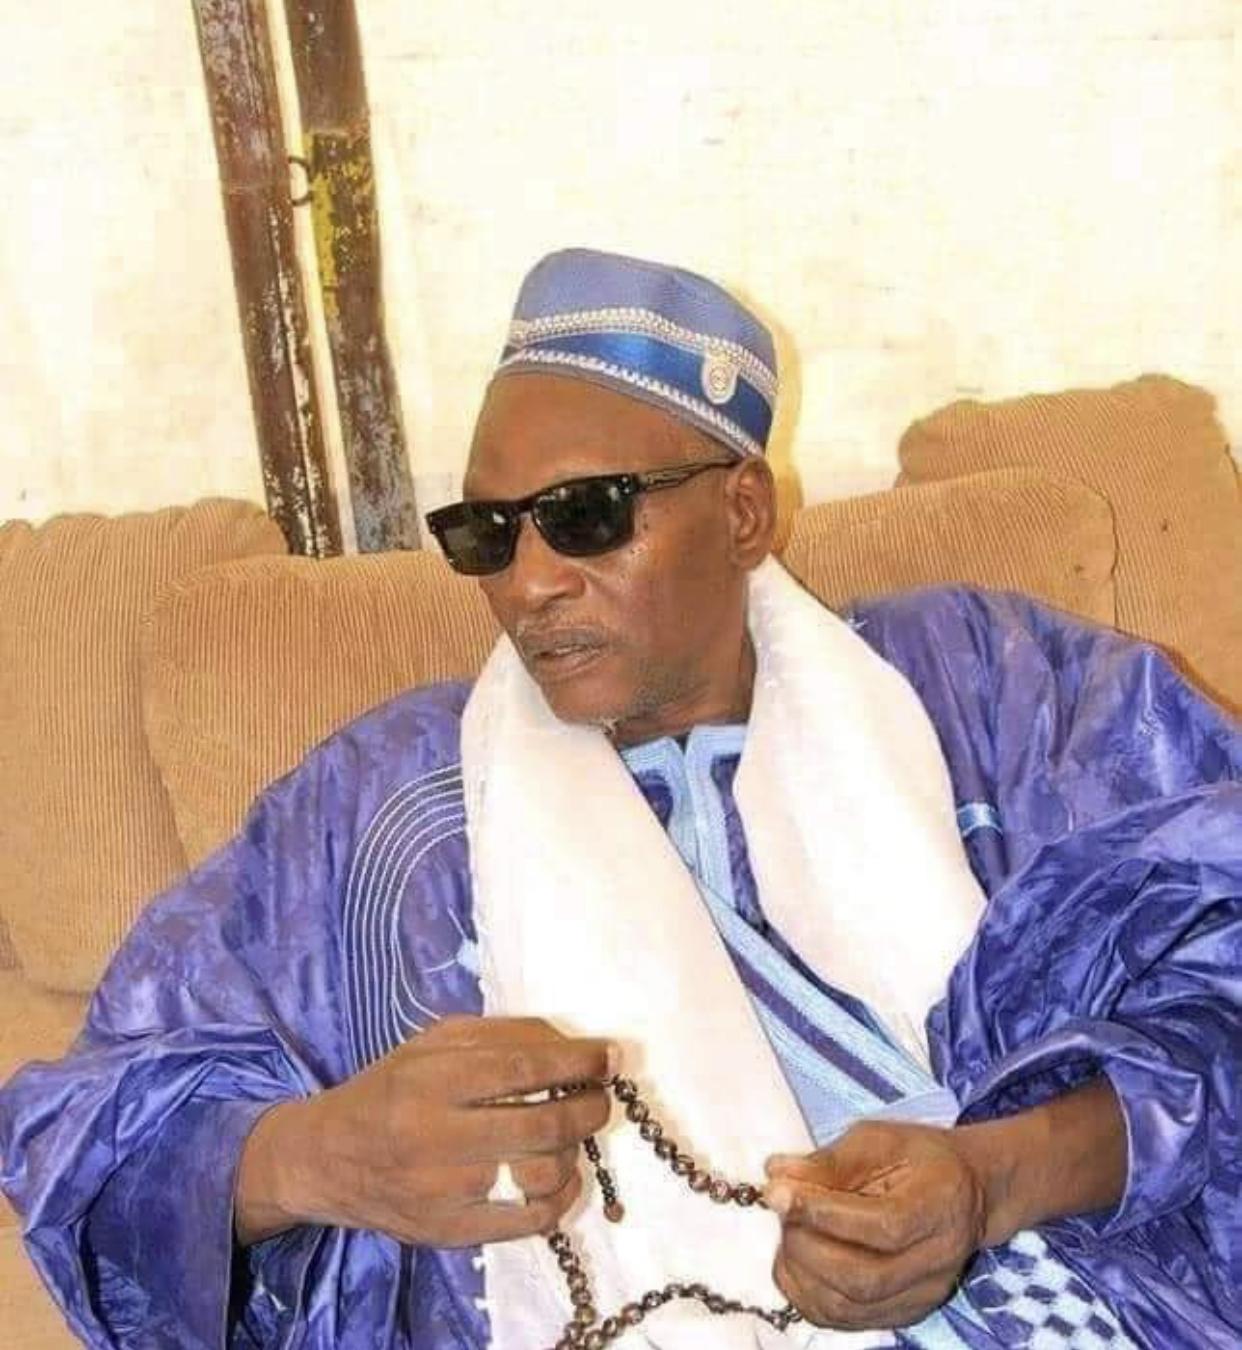 L'histoire de la voie Mouride retiendra le nom de Serigne Mamadou Mamoune Mbacke ibn Serigne Ibrahima Mbacke Ndar.